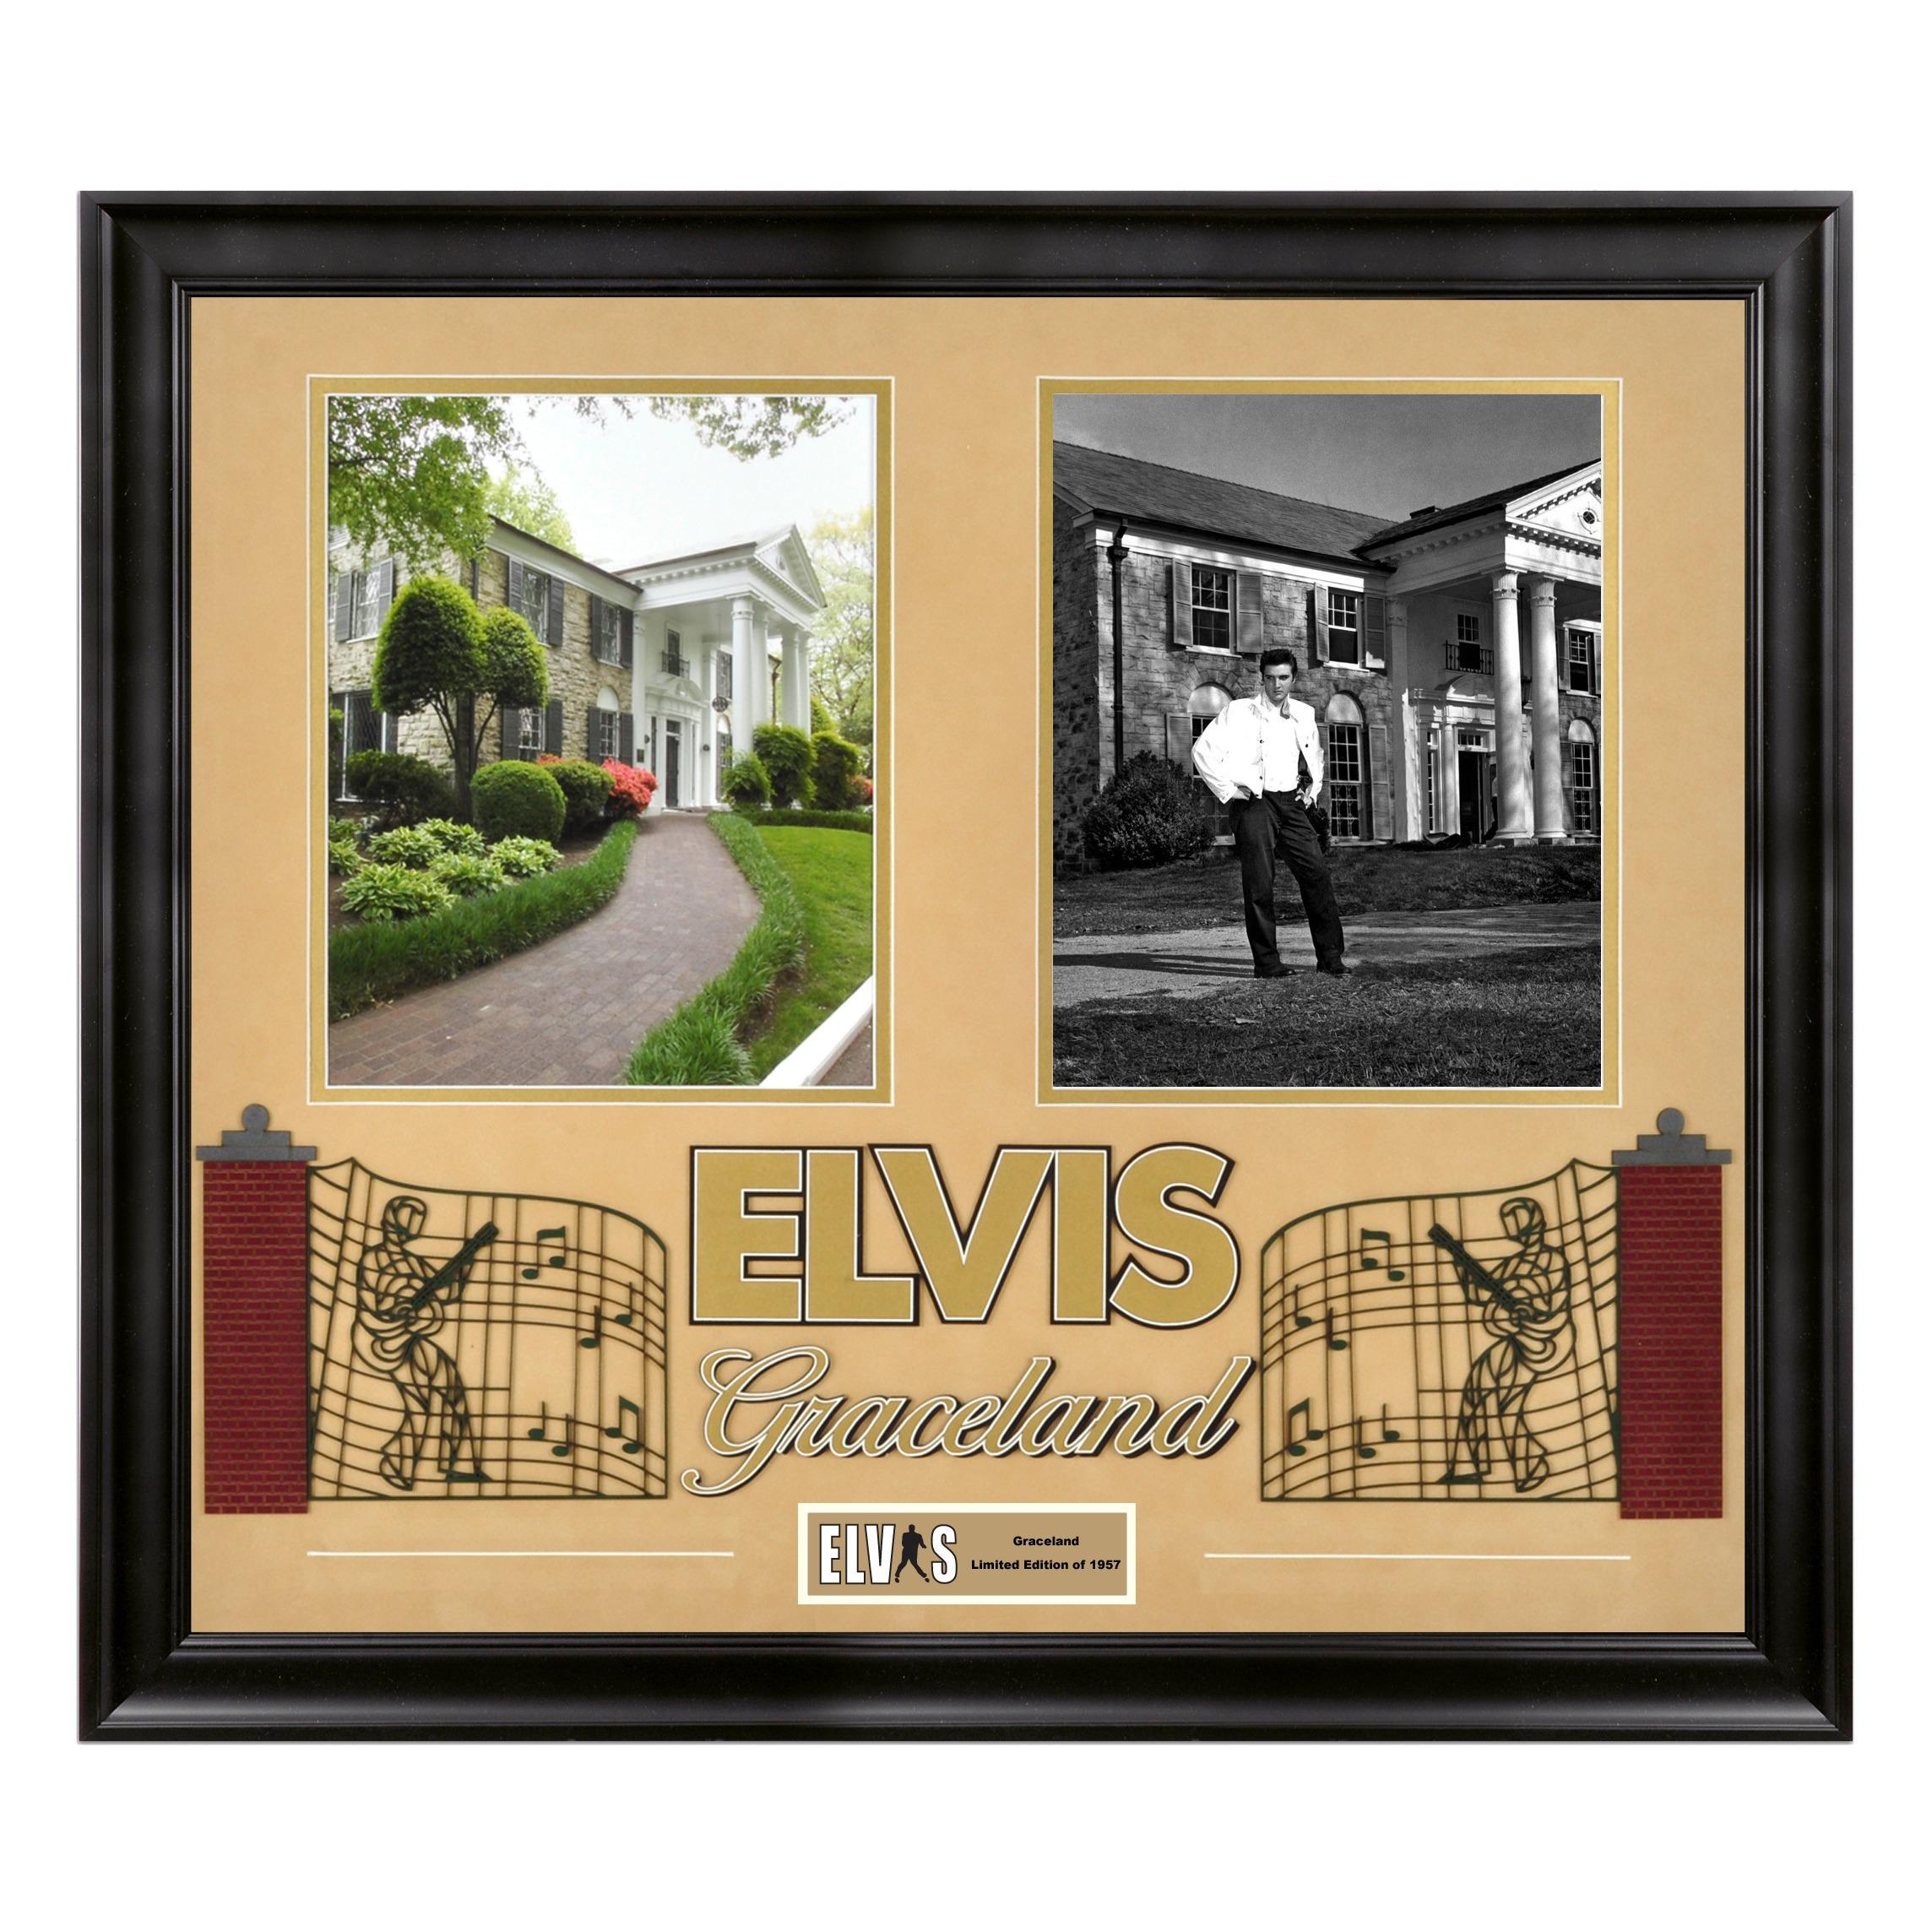 Elvis Presley 'Graceland'